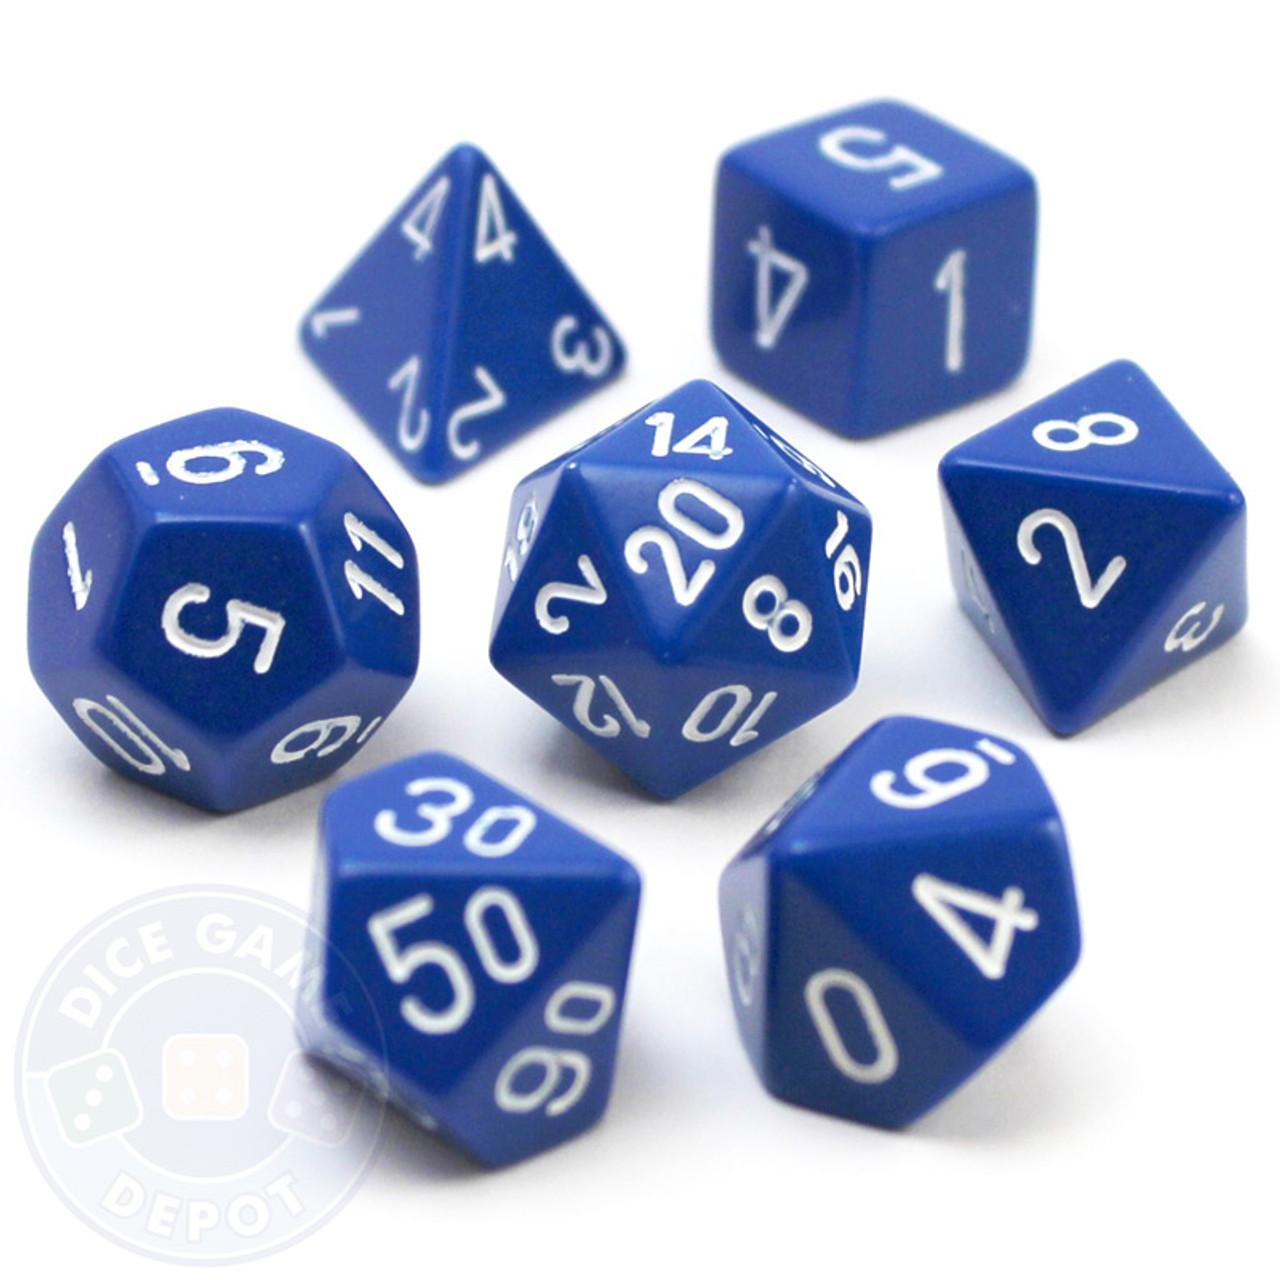 Chessex Opaque dice set light purple white set of 12 standard dice set 16mm